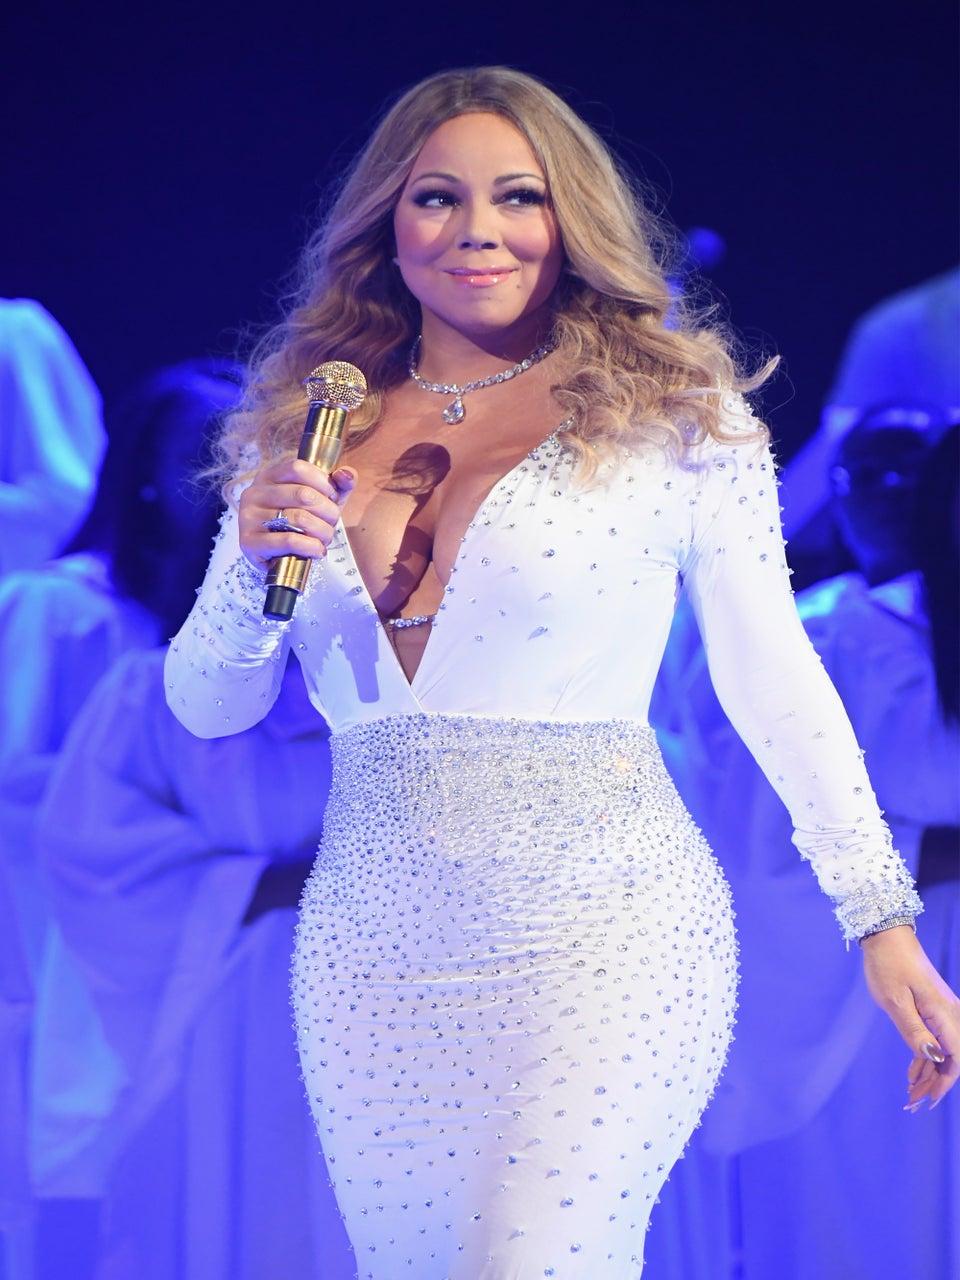 Mariah Carey ReactedTo The Las Vegas Shooting Live On-Air